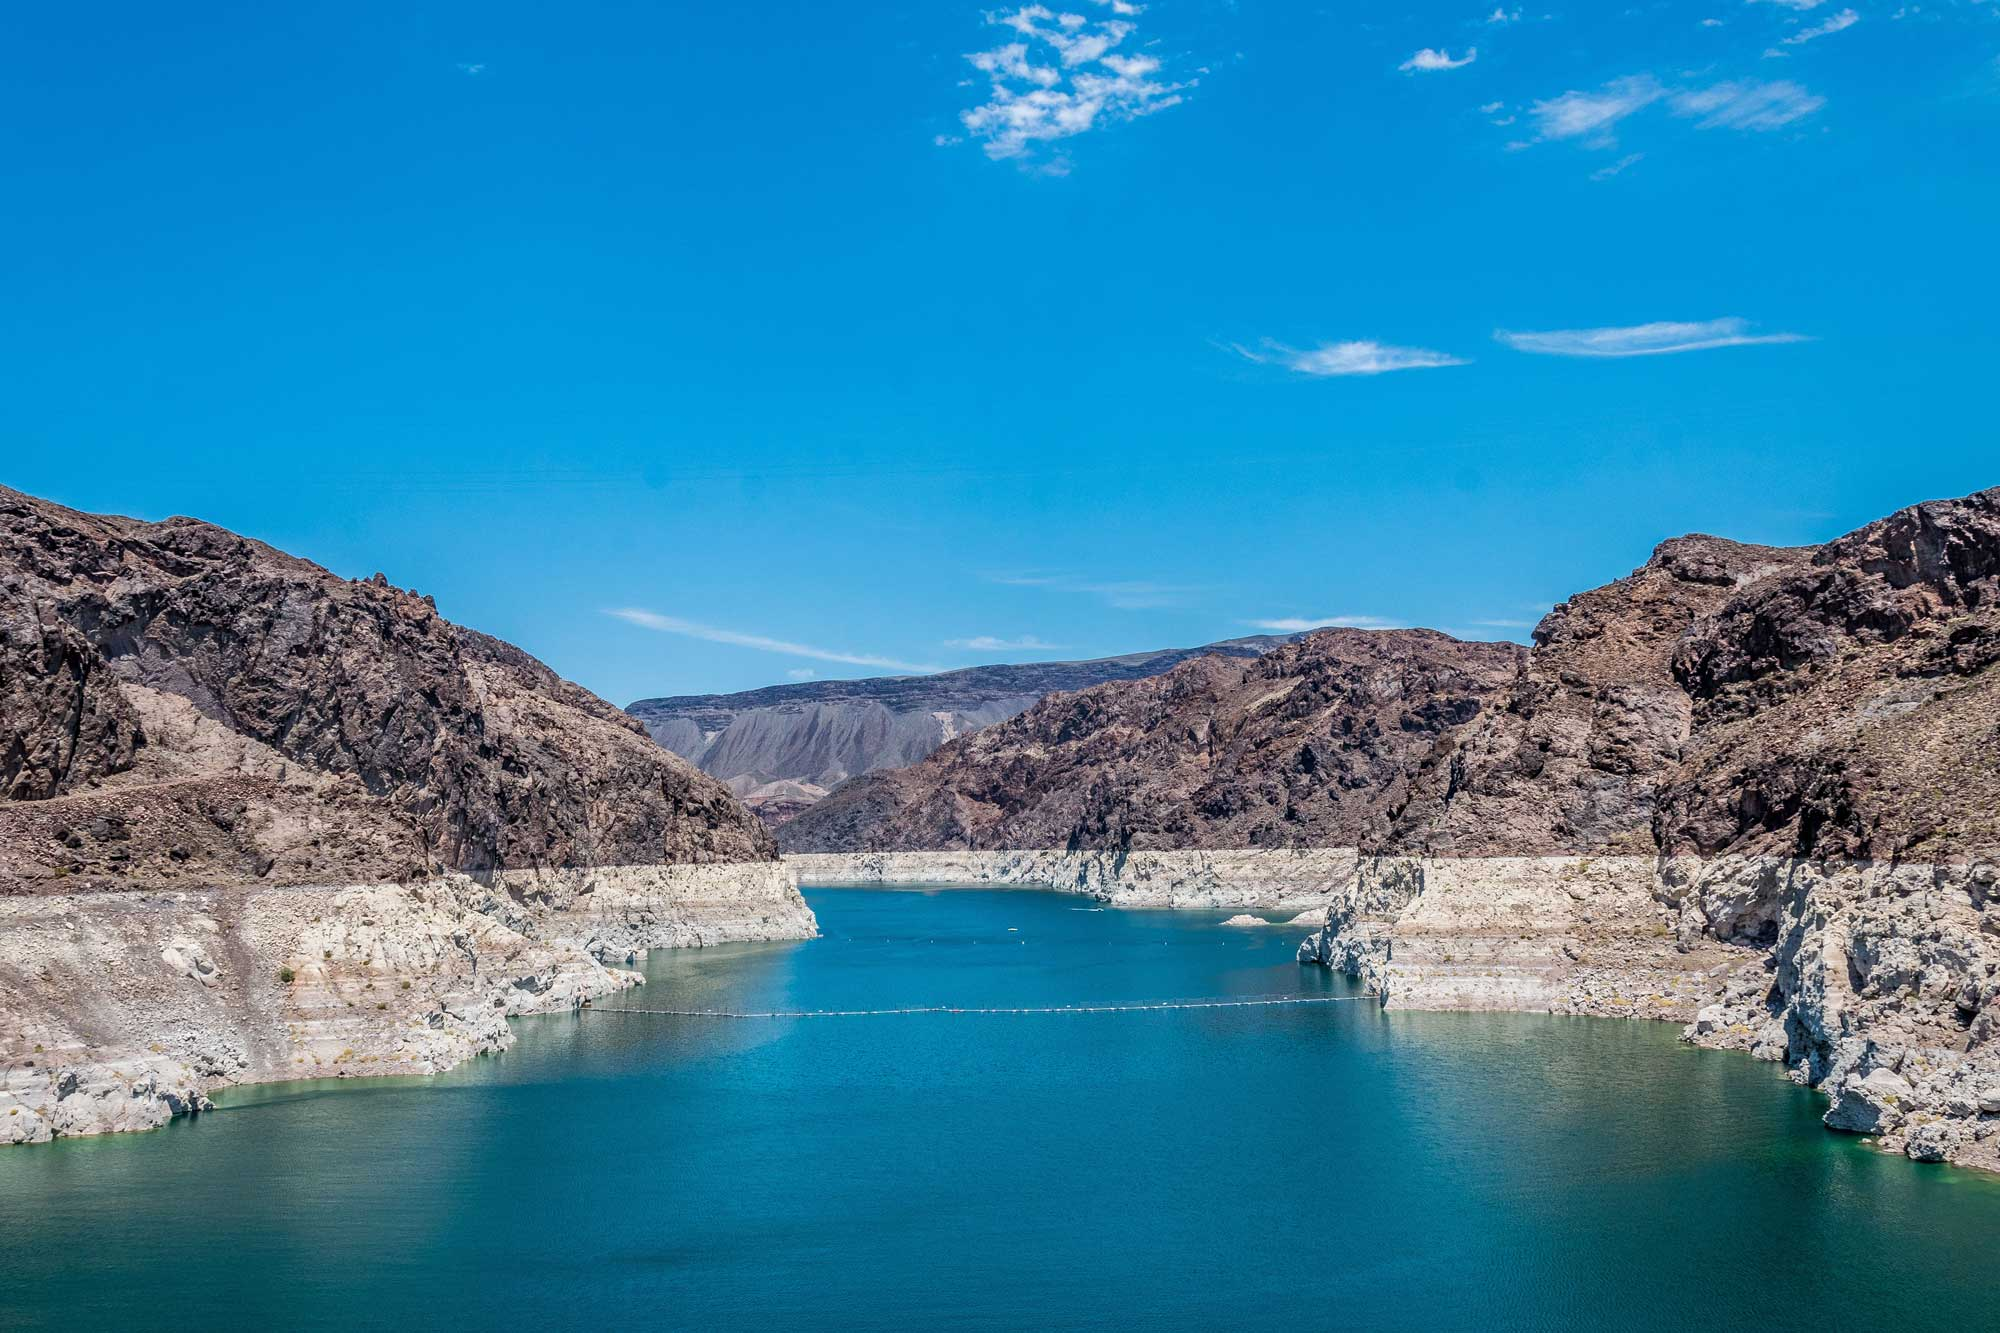 photo - Lake Mead